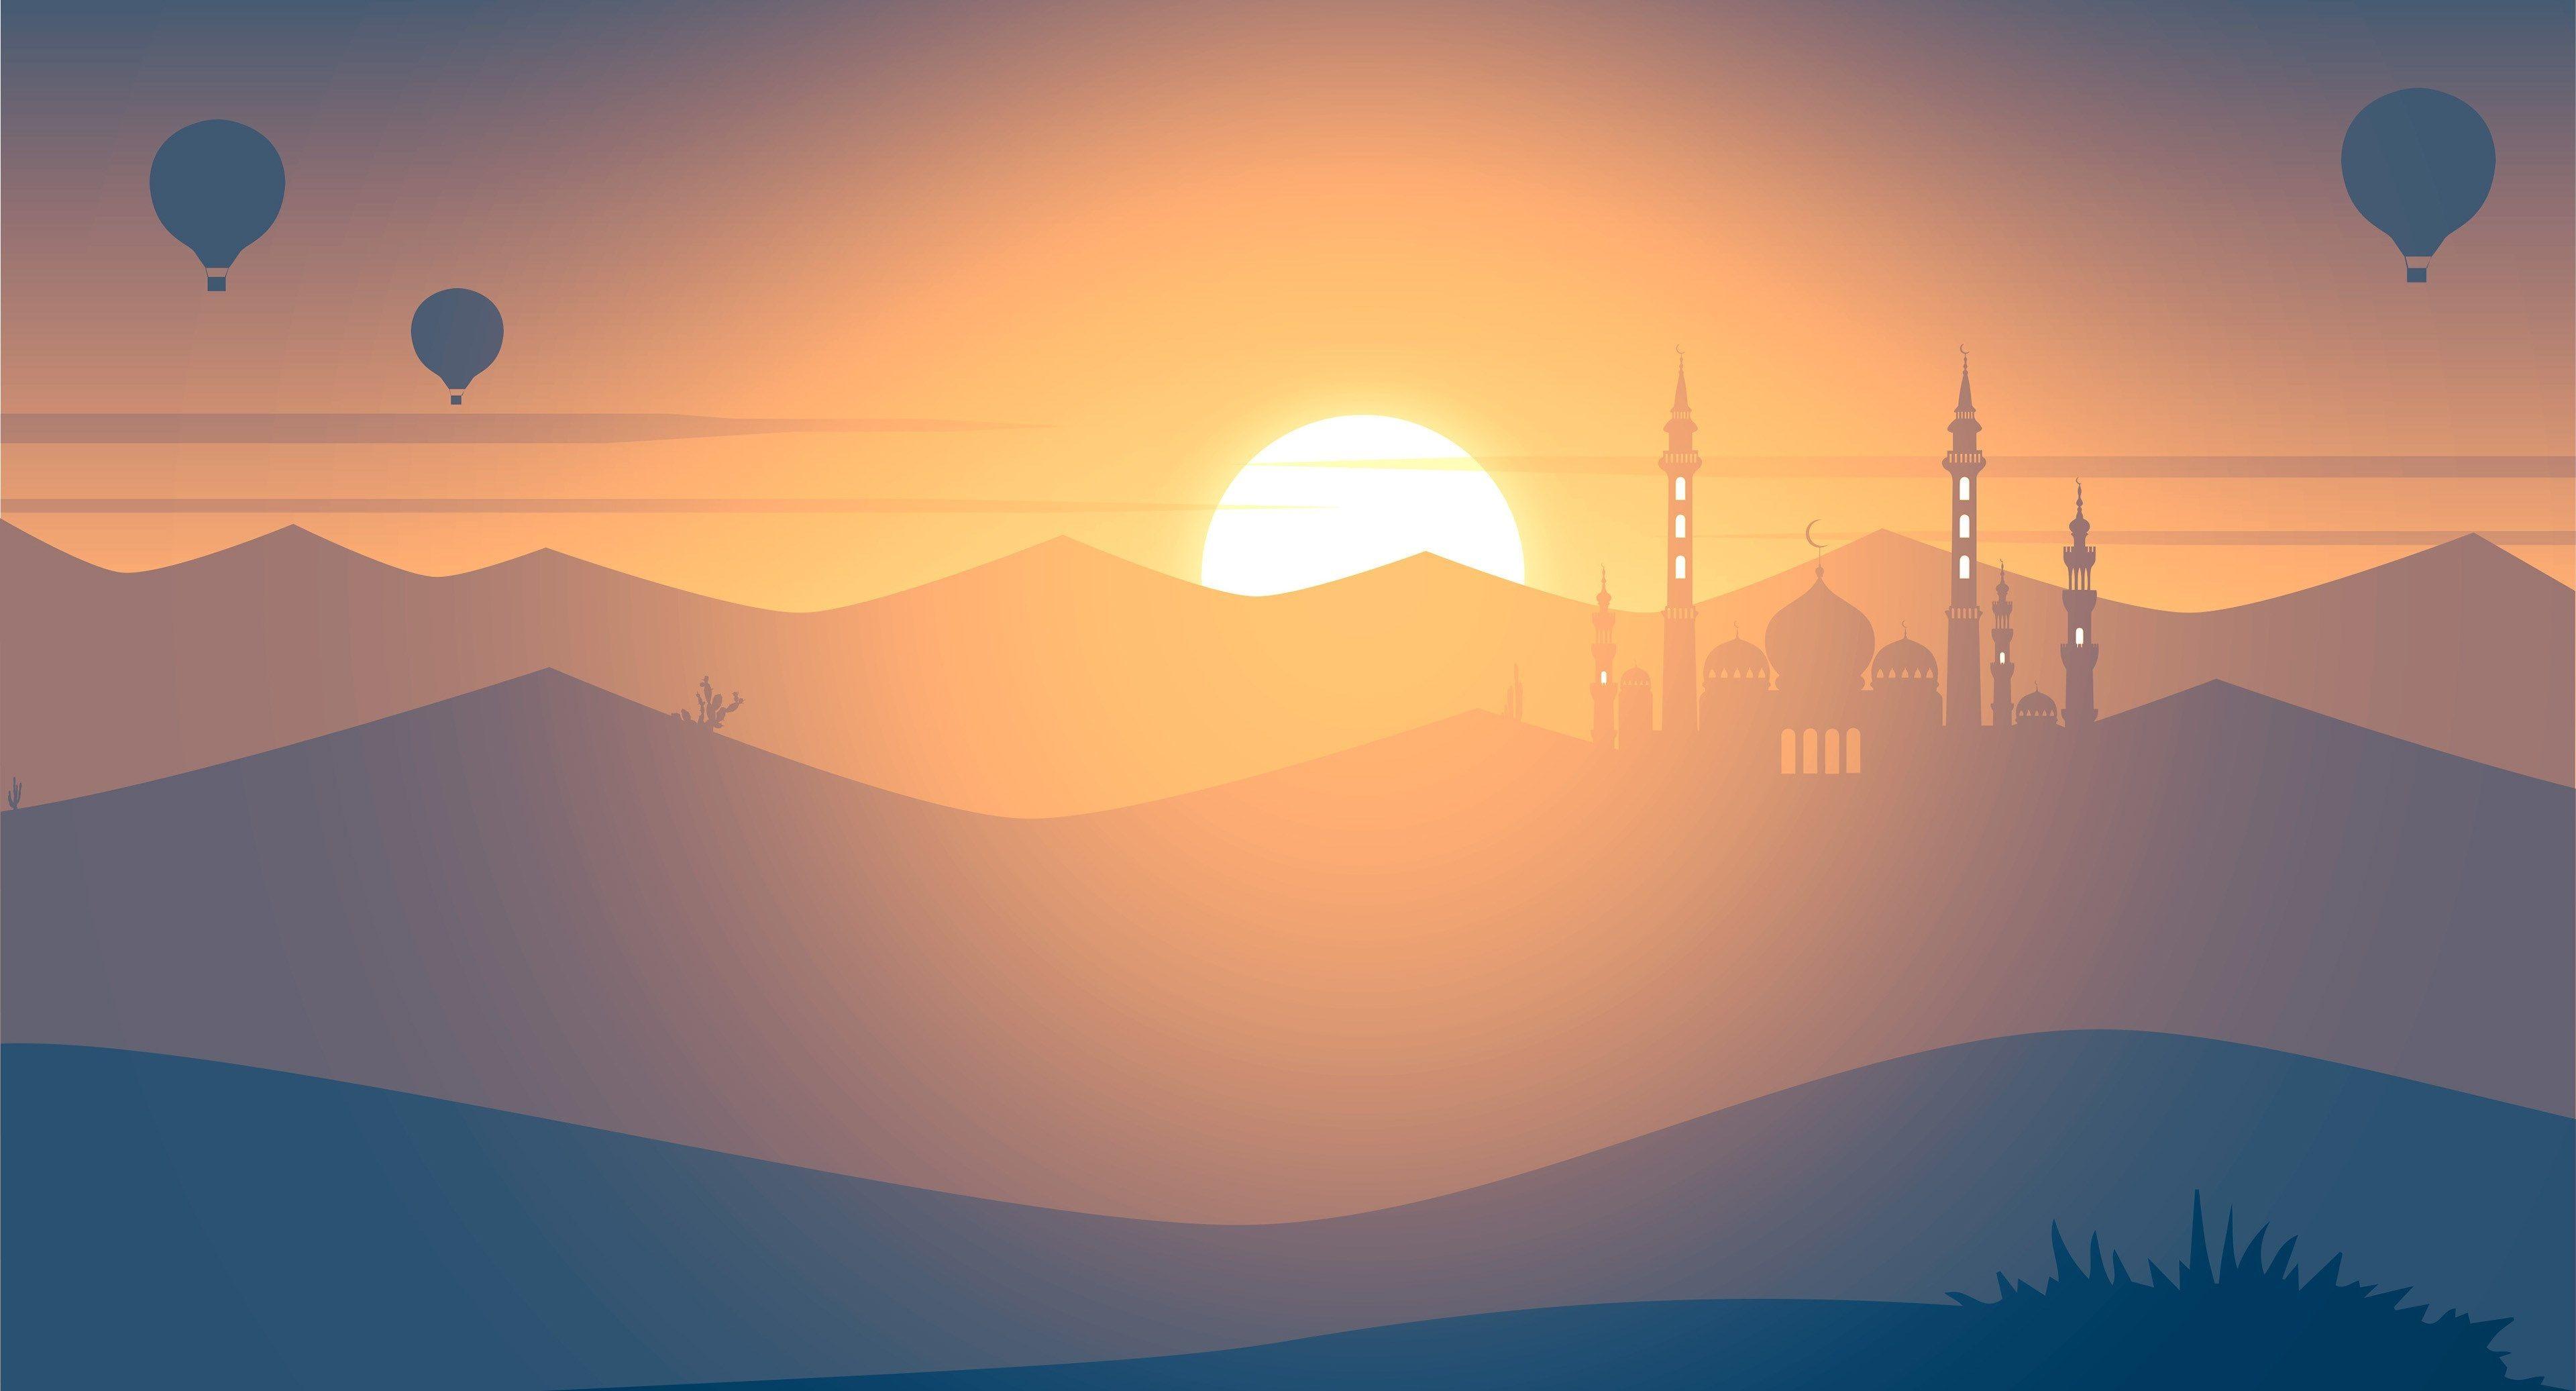 3840x2073 Sunset 4k Backgrounds Images Islamic Wallpaper Hd Background Images Minimalist Wallpaper